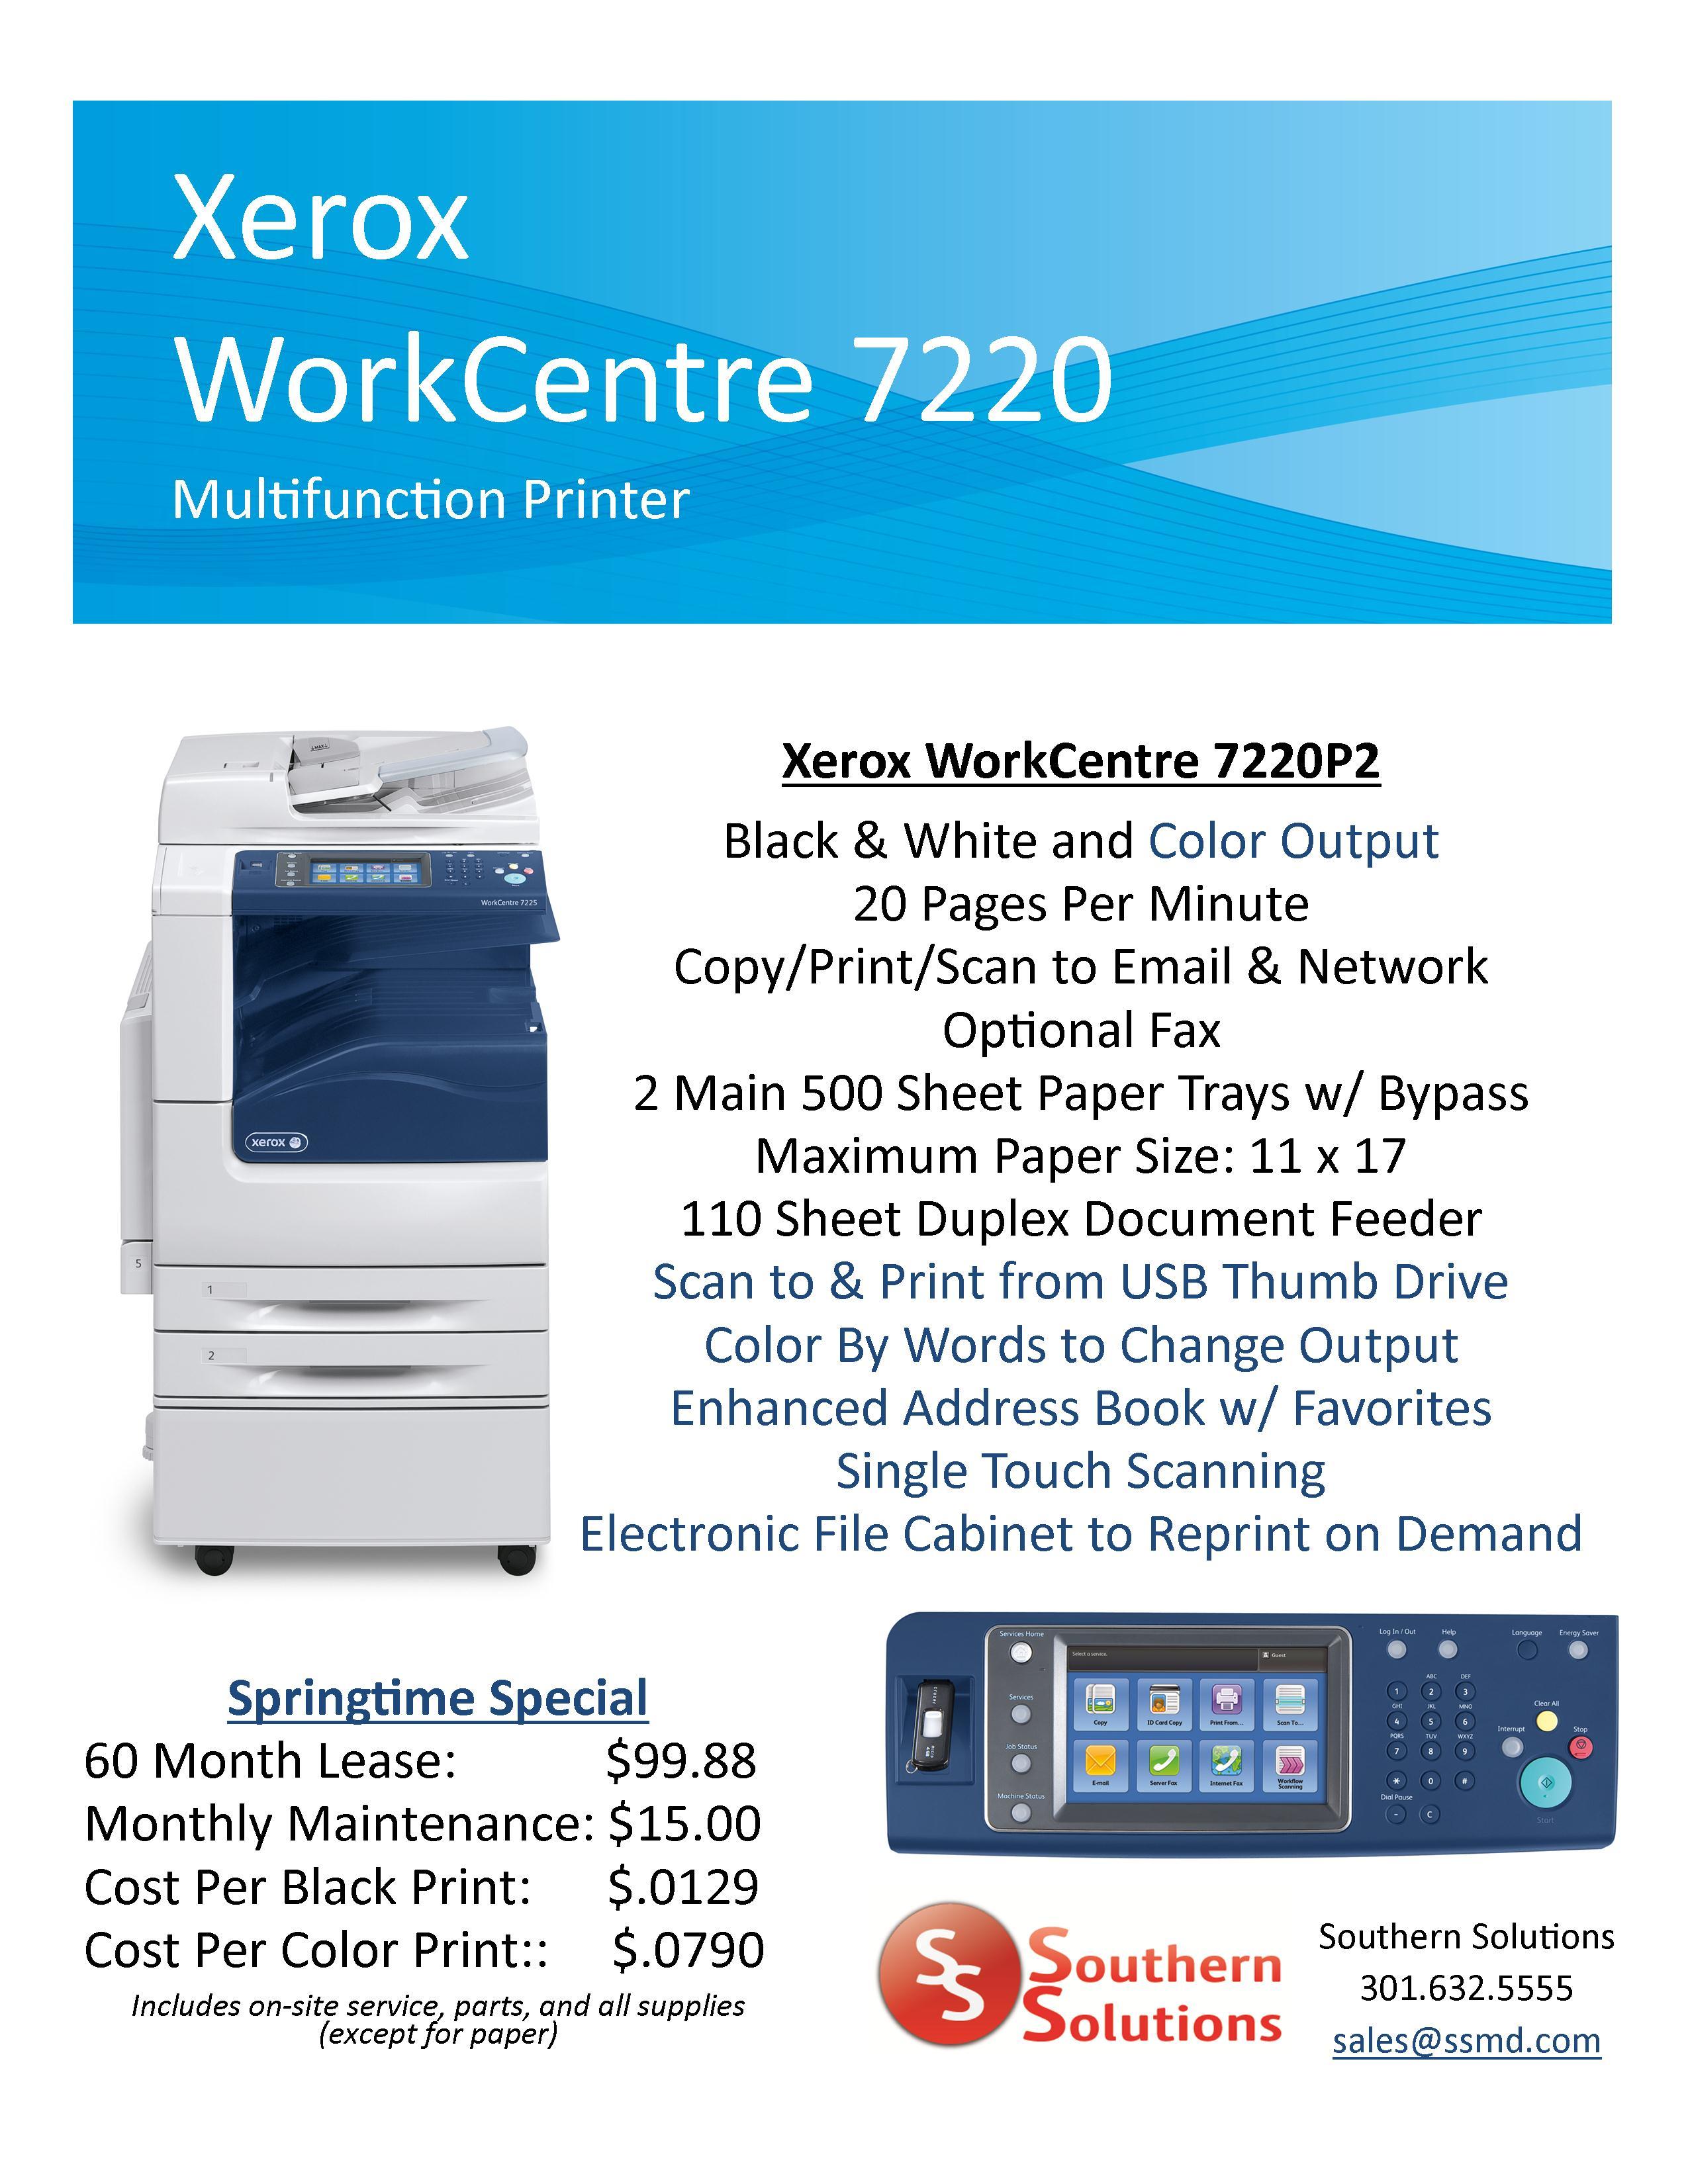 WorkCentre 7220 Springtime Special Website 5.14.13